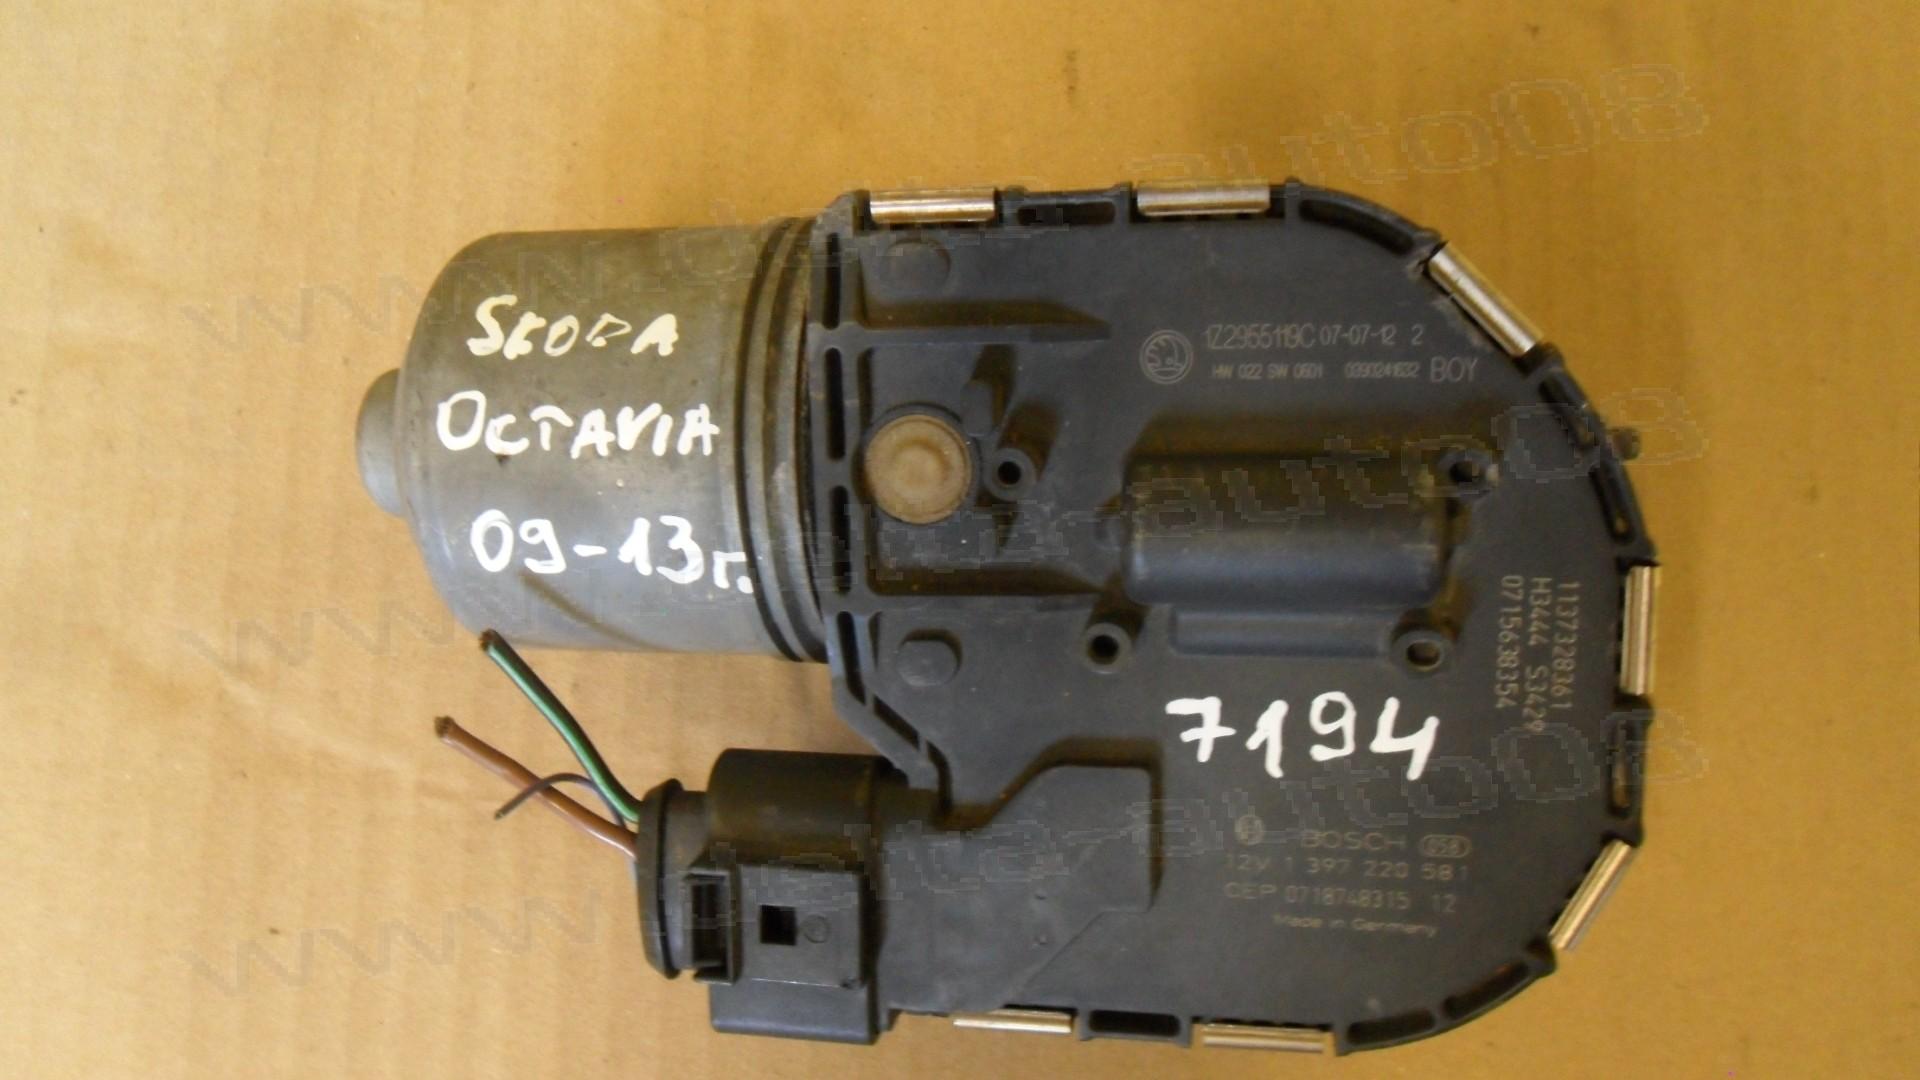 Мотор предни чистачки за Skoda Octavia, 2009-2013г., 1Z37328361, 1 397 220 581, 1397220581, 1137328361